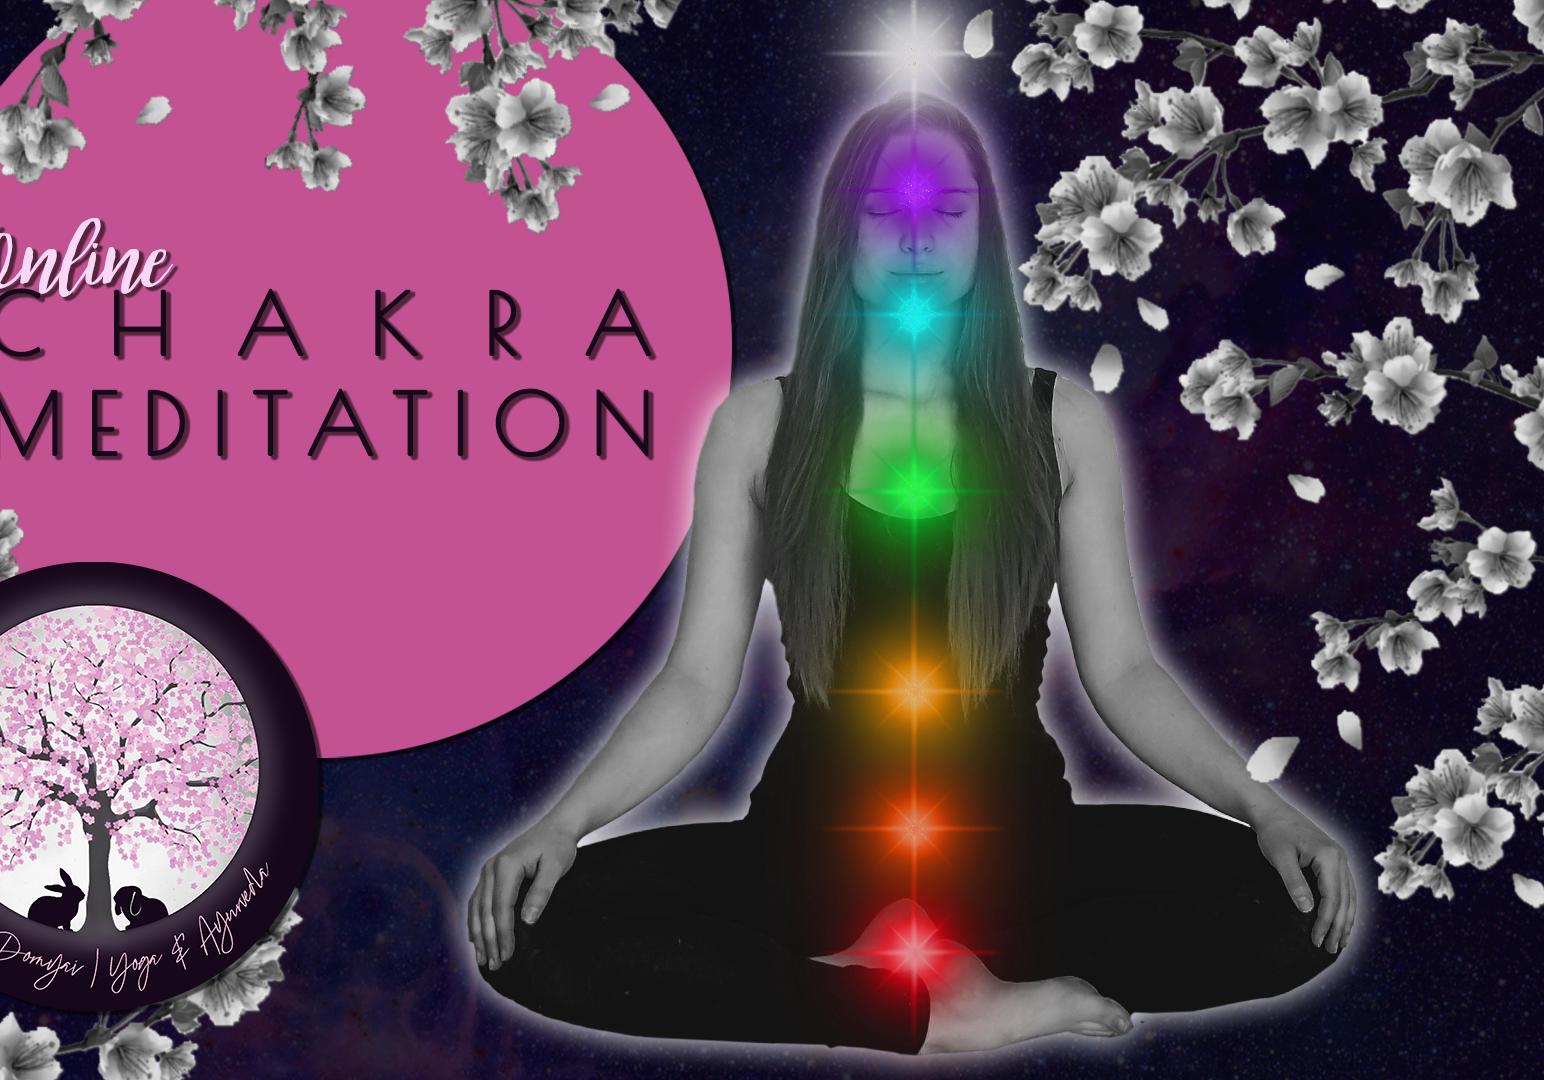 FB-Event-Photo-Online-Chakra-Meditation-1.png